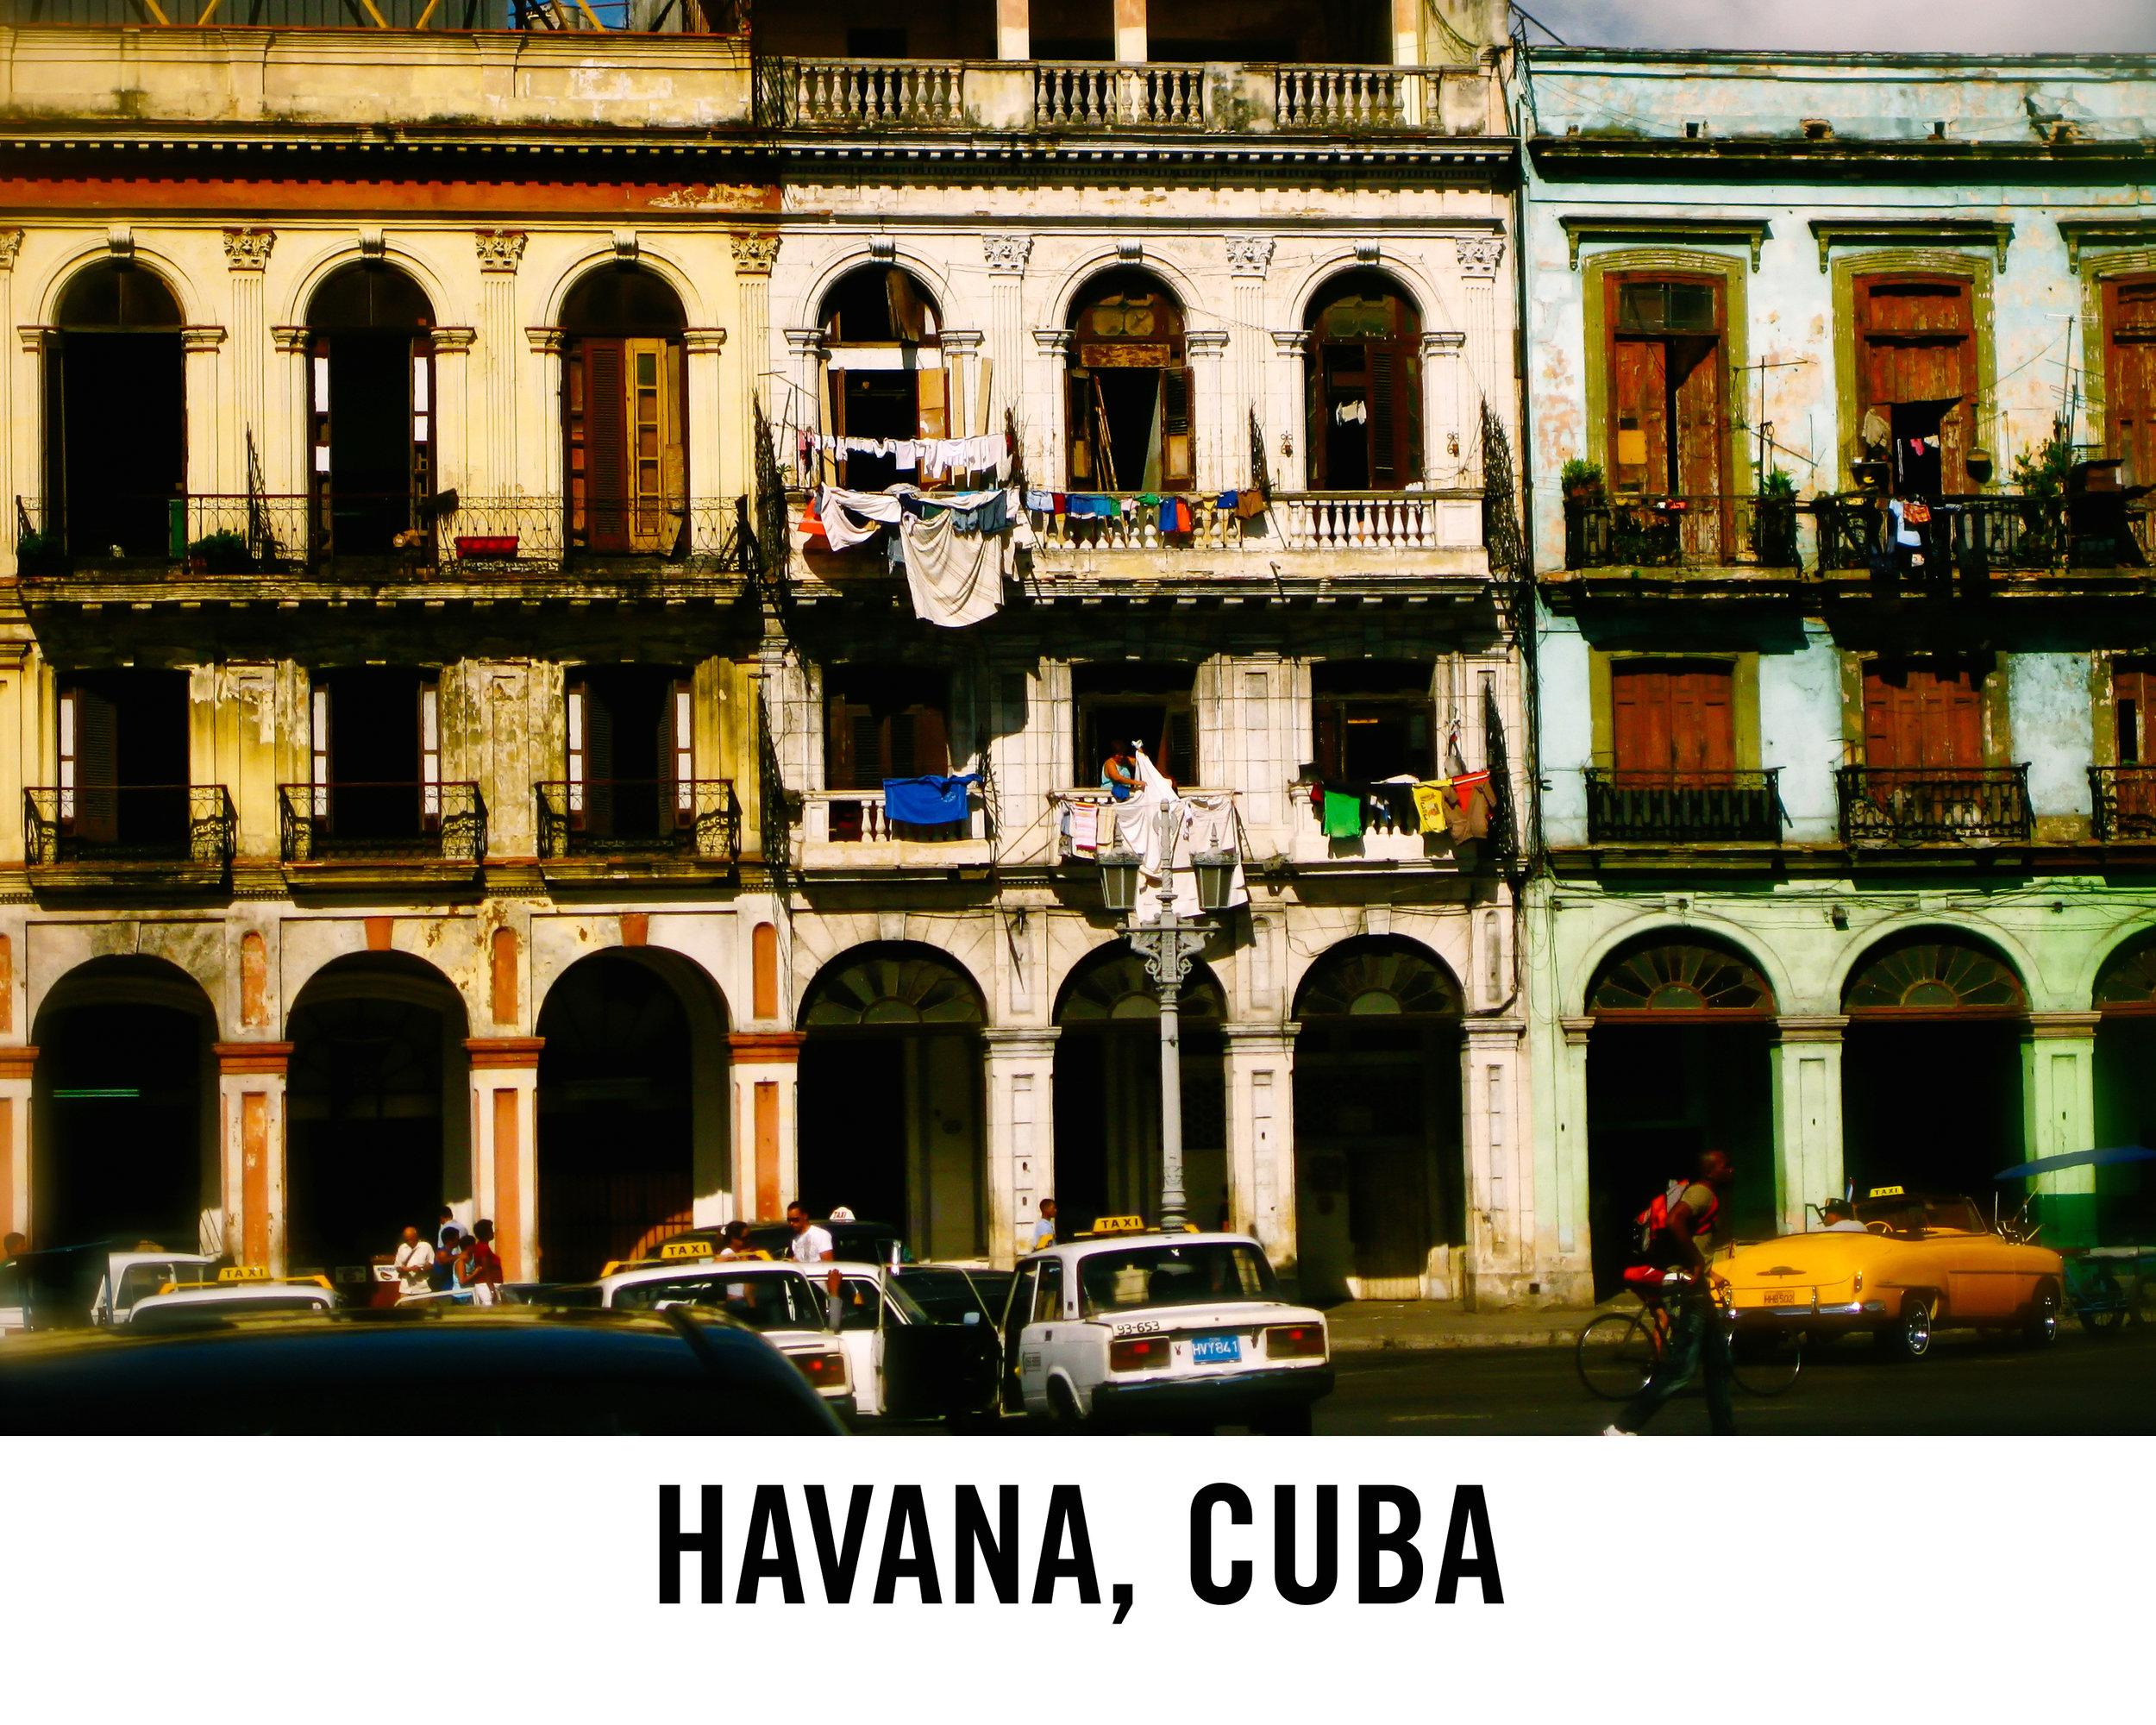 Havana_WebGraphic2.jpg